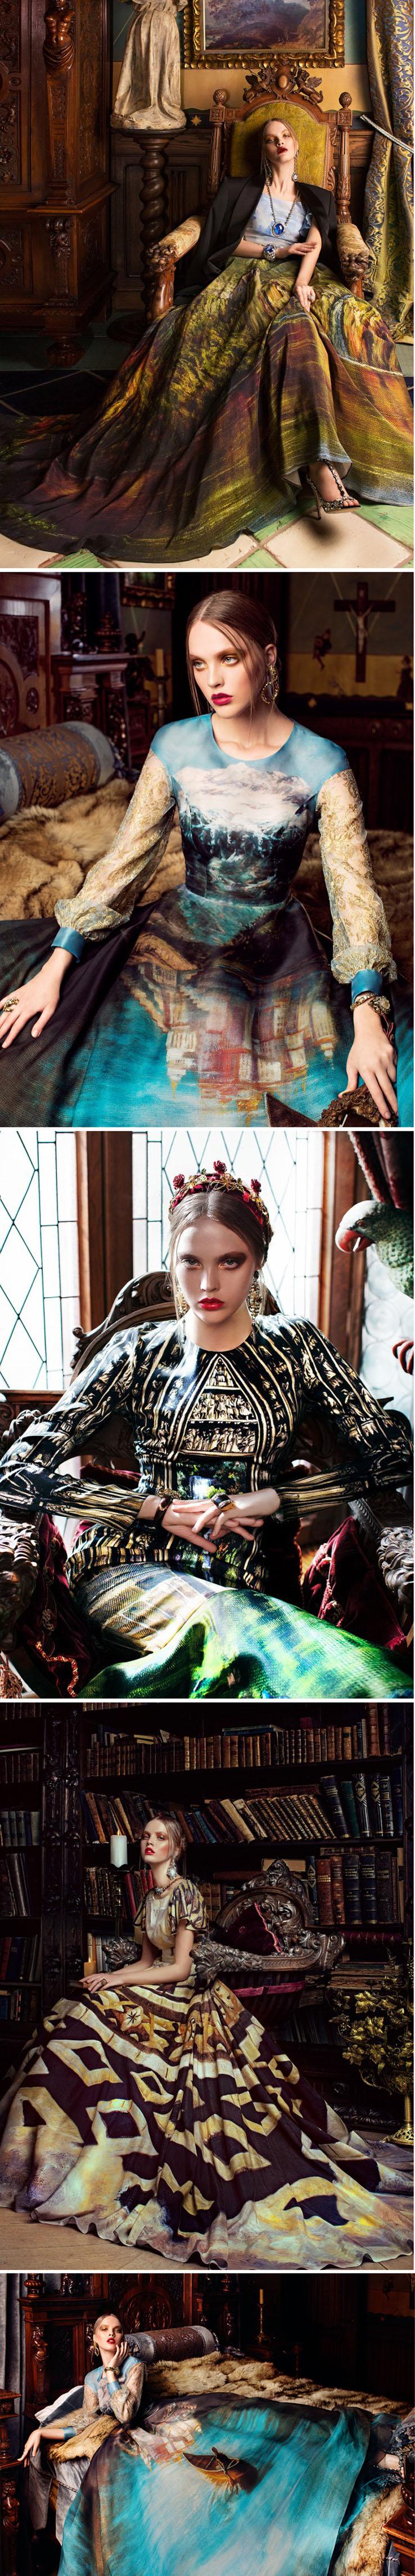 Vestidos de alta costura adornados com estampas de pinturas clássicas stylo urbano-1